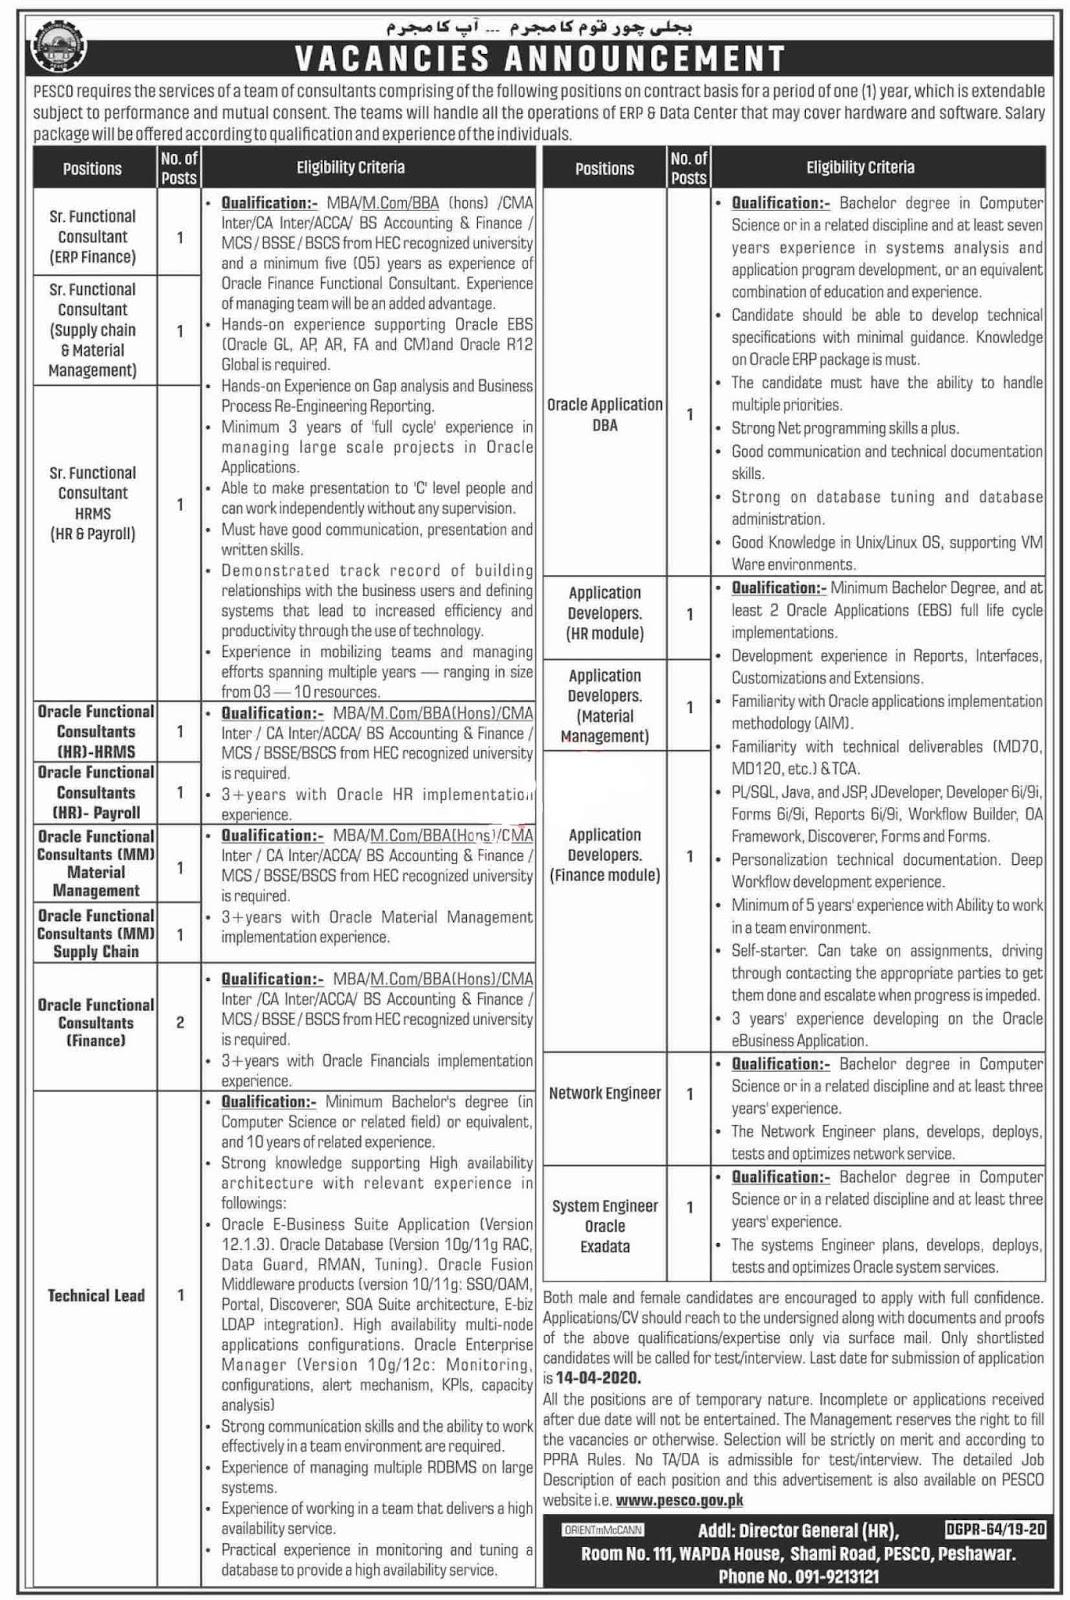 Latest PESCO jobs 2020 Advertisement| WAPDA Jobs 2020